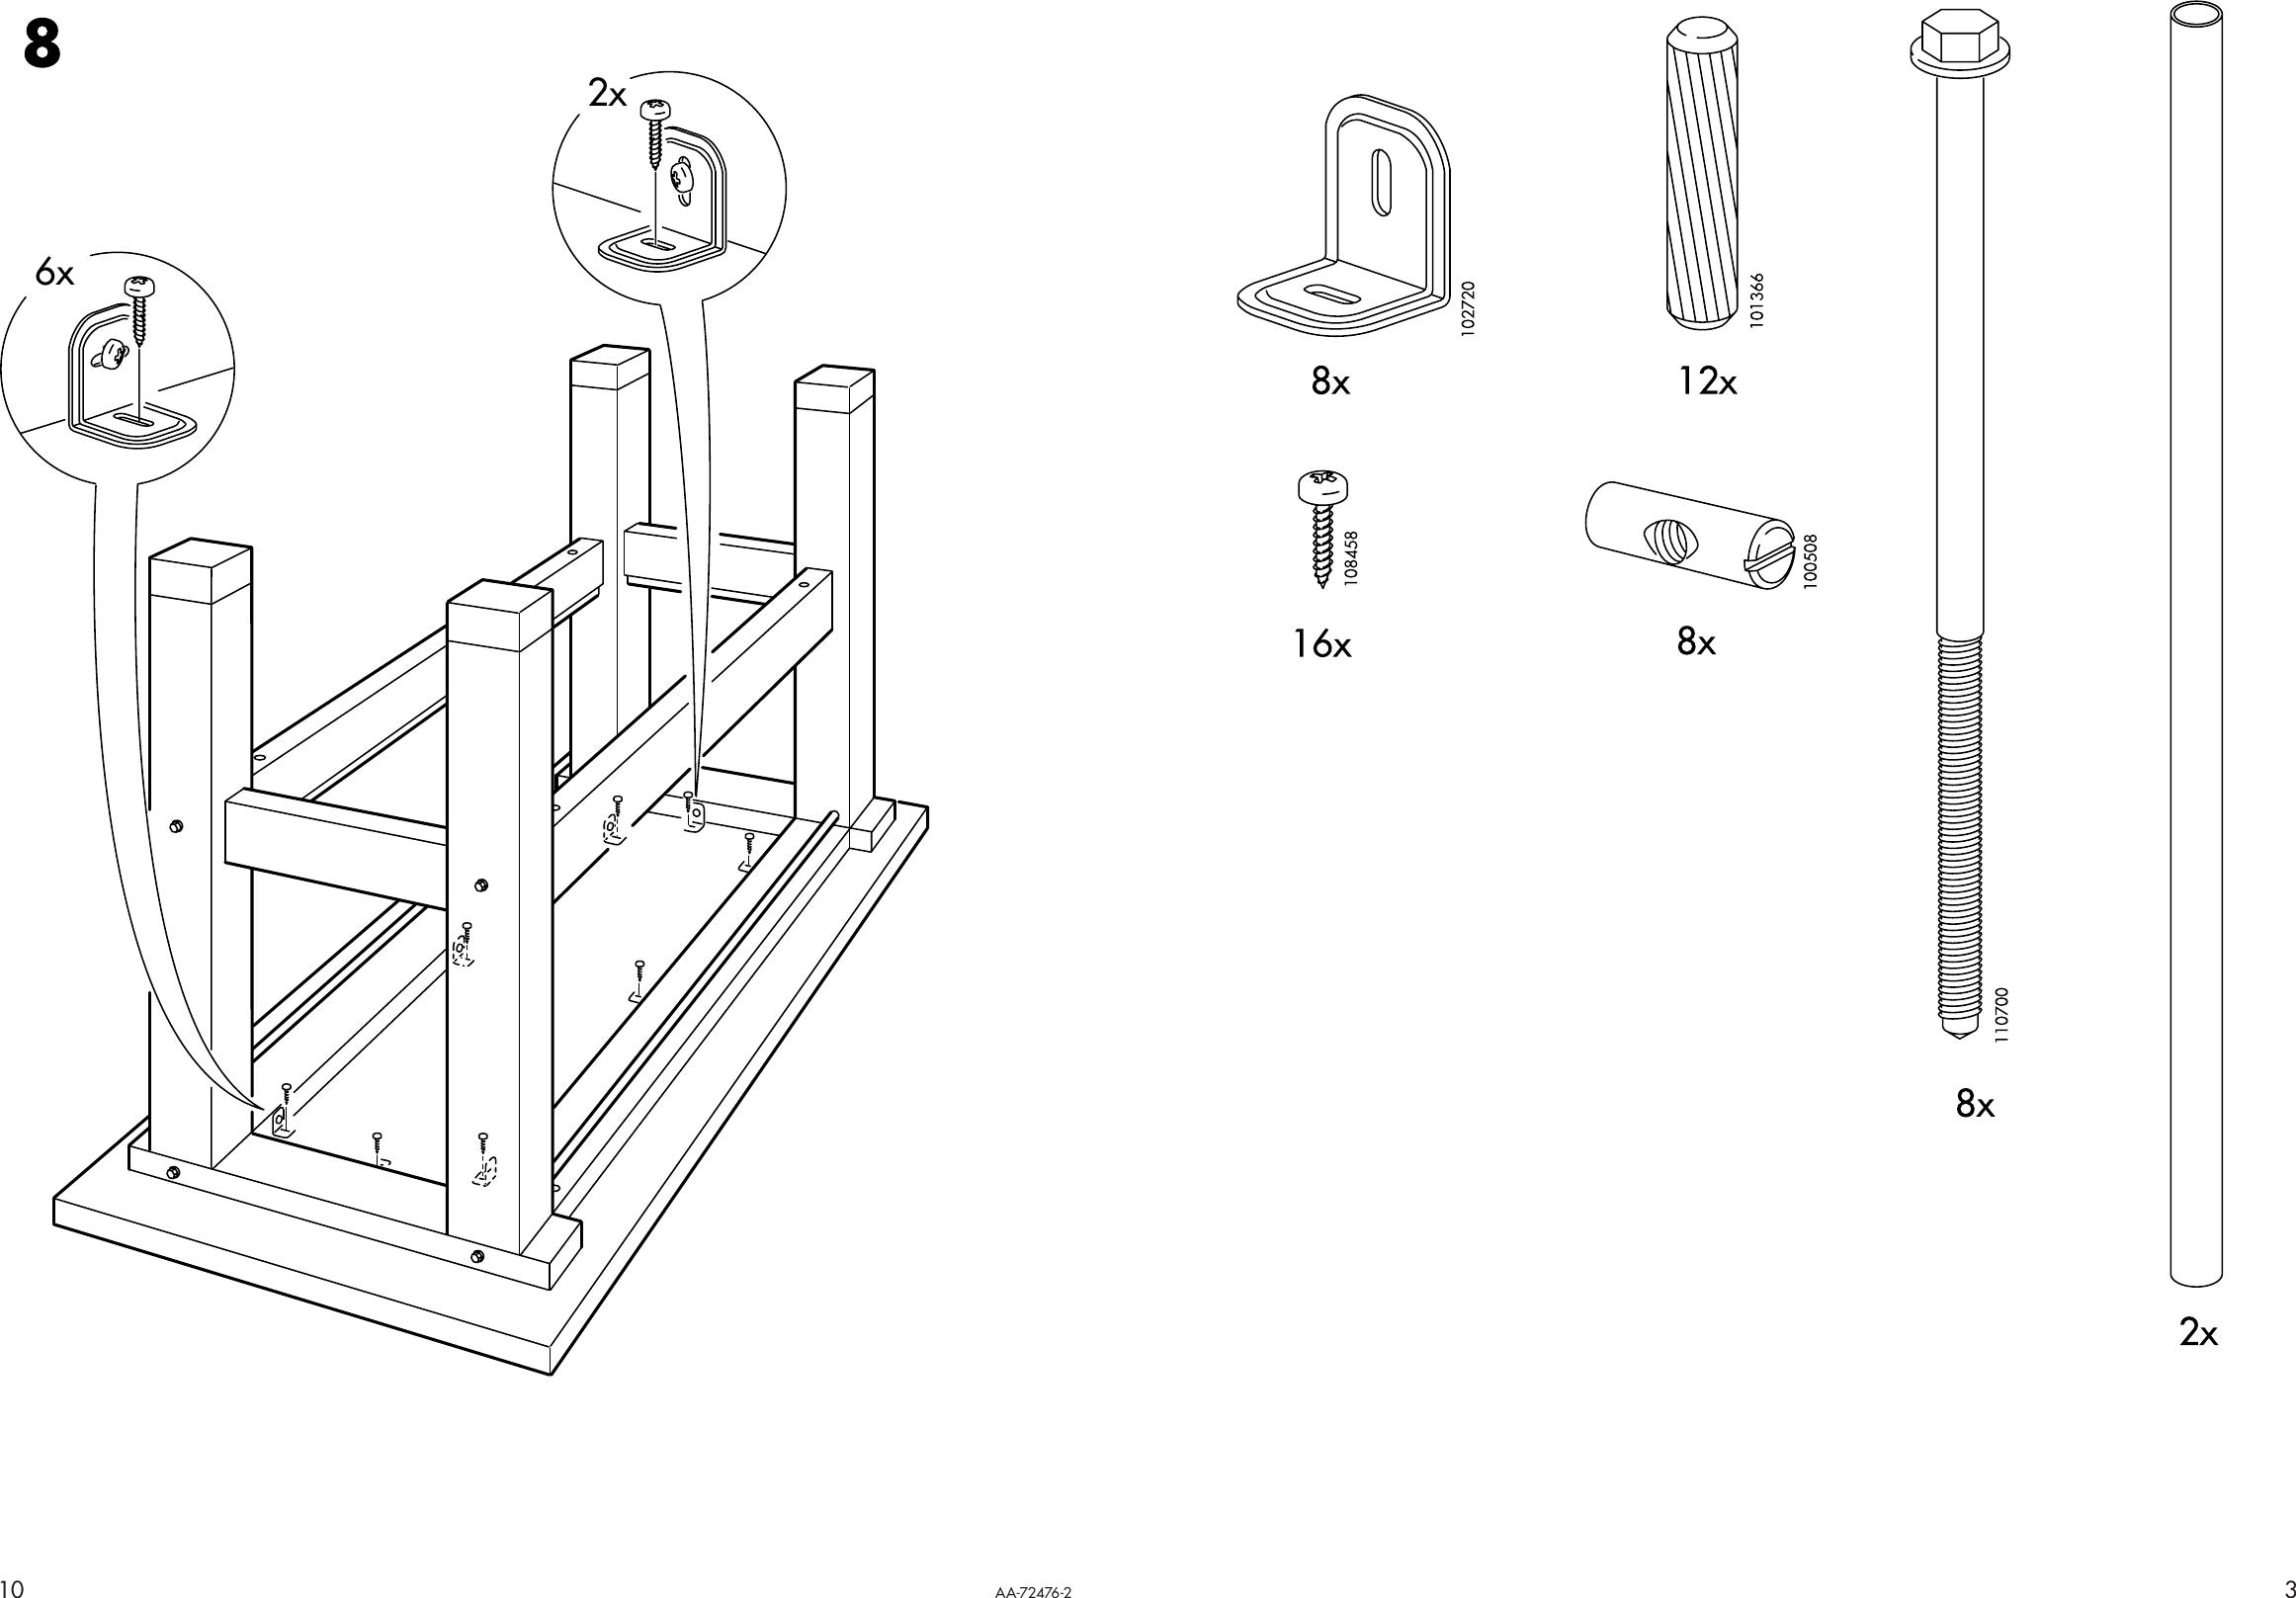 Ikea Groland Kitchen Island 47x35 Assembly Instruction 0